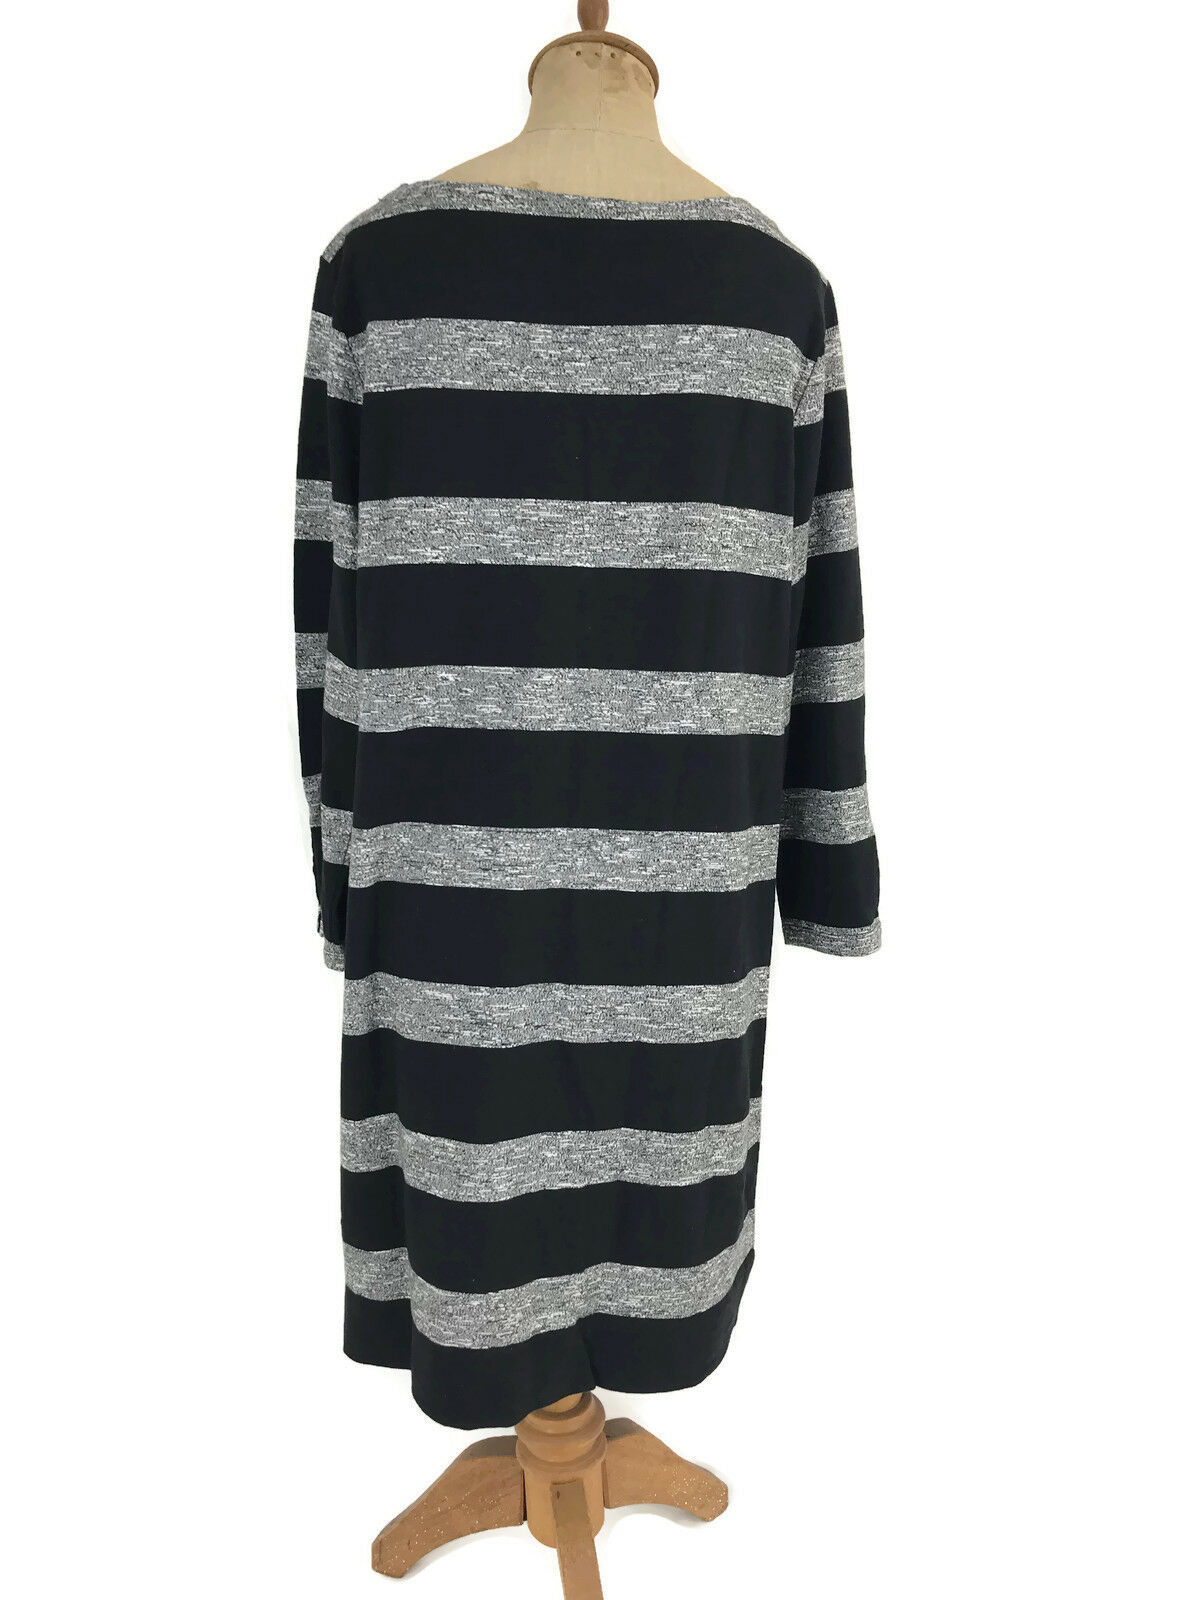 J. Crew Factory Dress Black Gray Stripe Boatneck 3/4 Sleeves Style 02665 Sz L U1 image 4